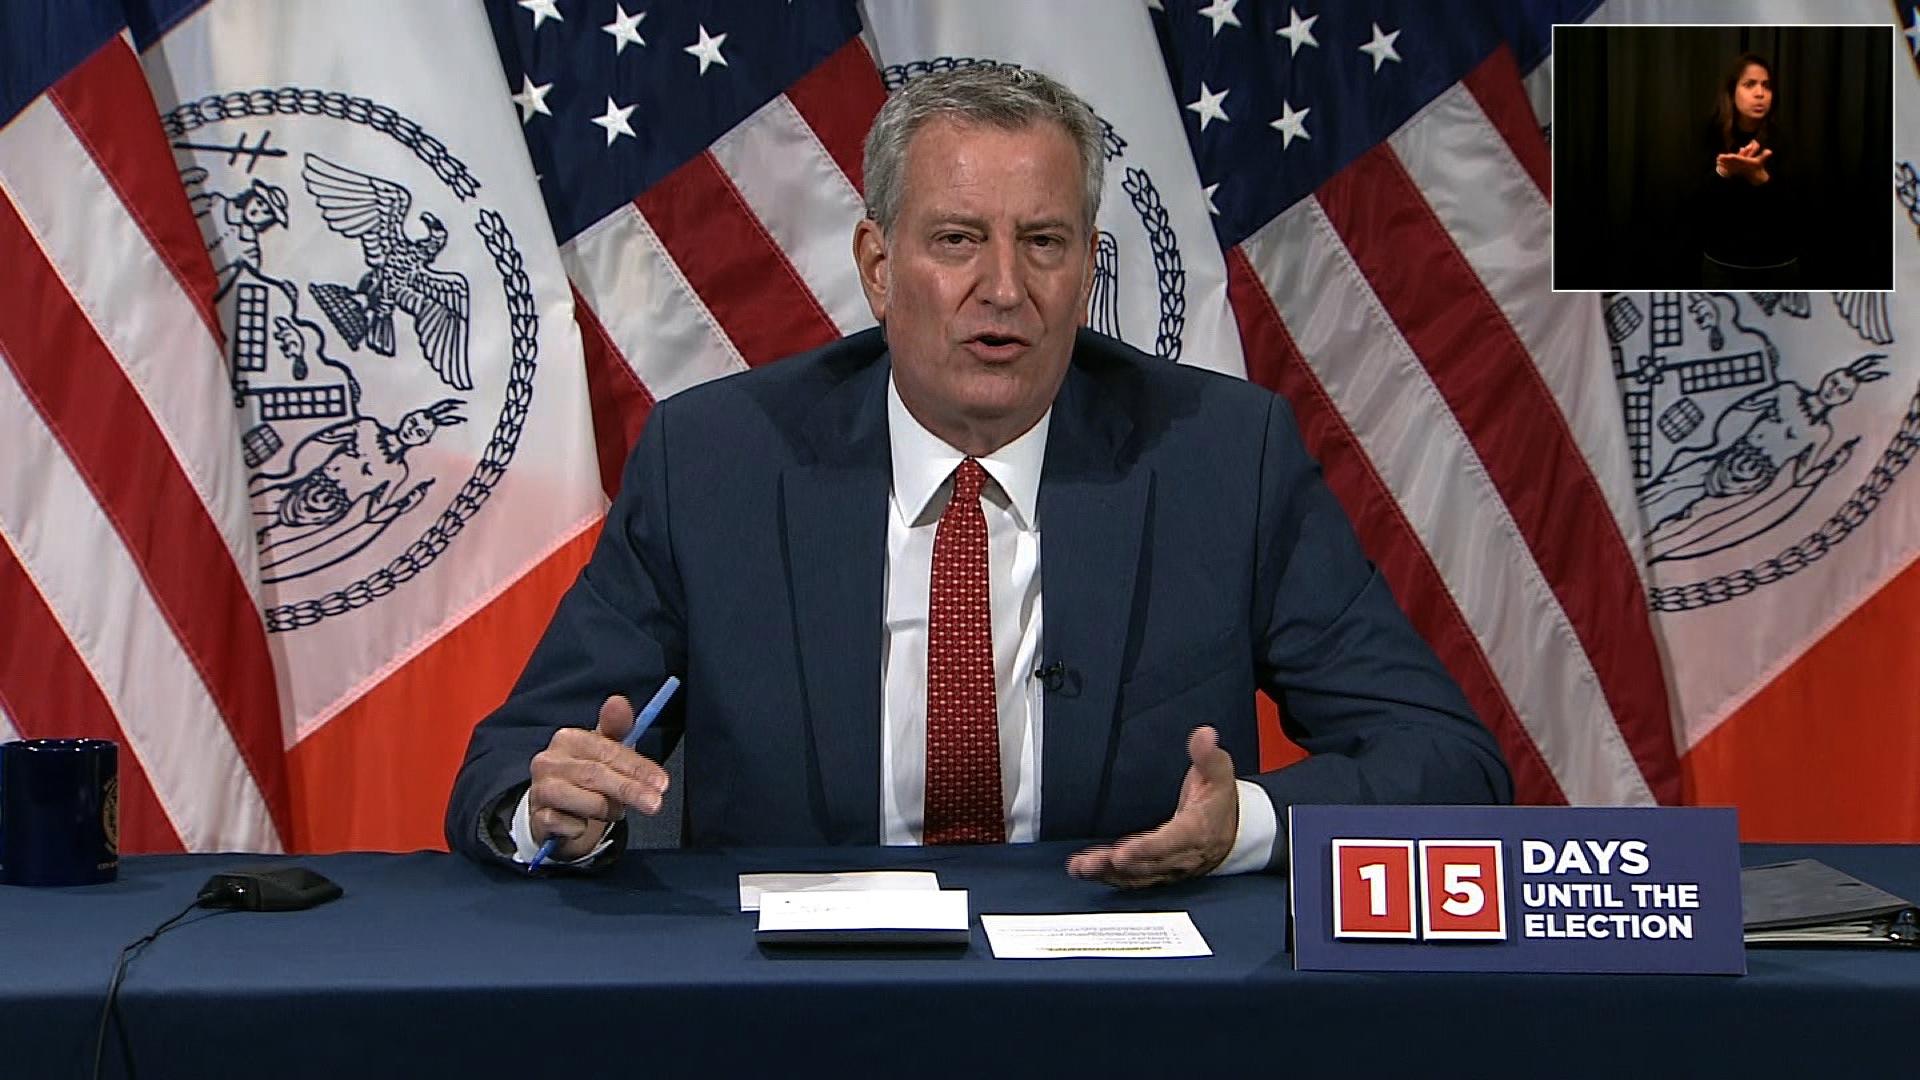 NYC Media